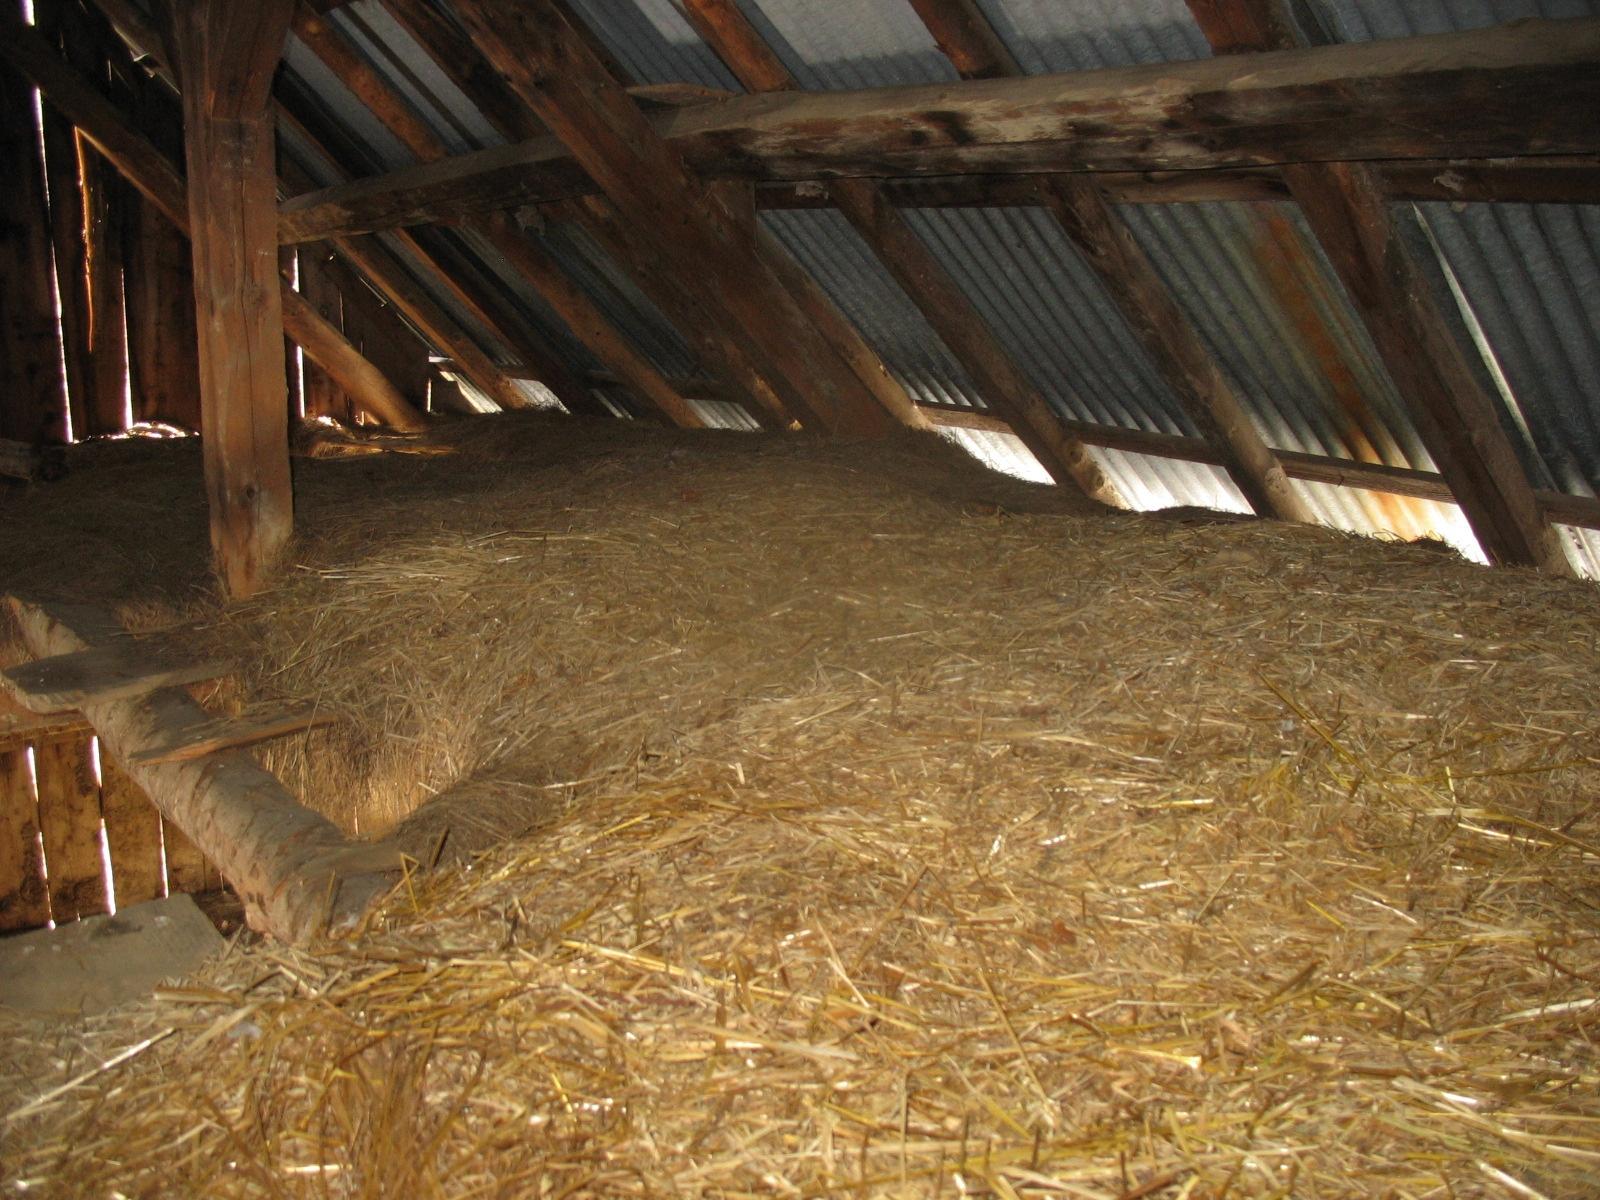 d coration cabane de jardin landi 89 creteil cabane de moiry cabane de lit cabane de. Black Bedroom Furniture Sets. Home Design Ideas